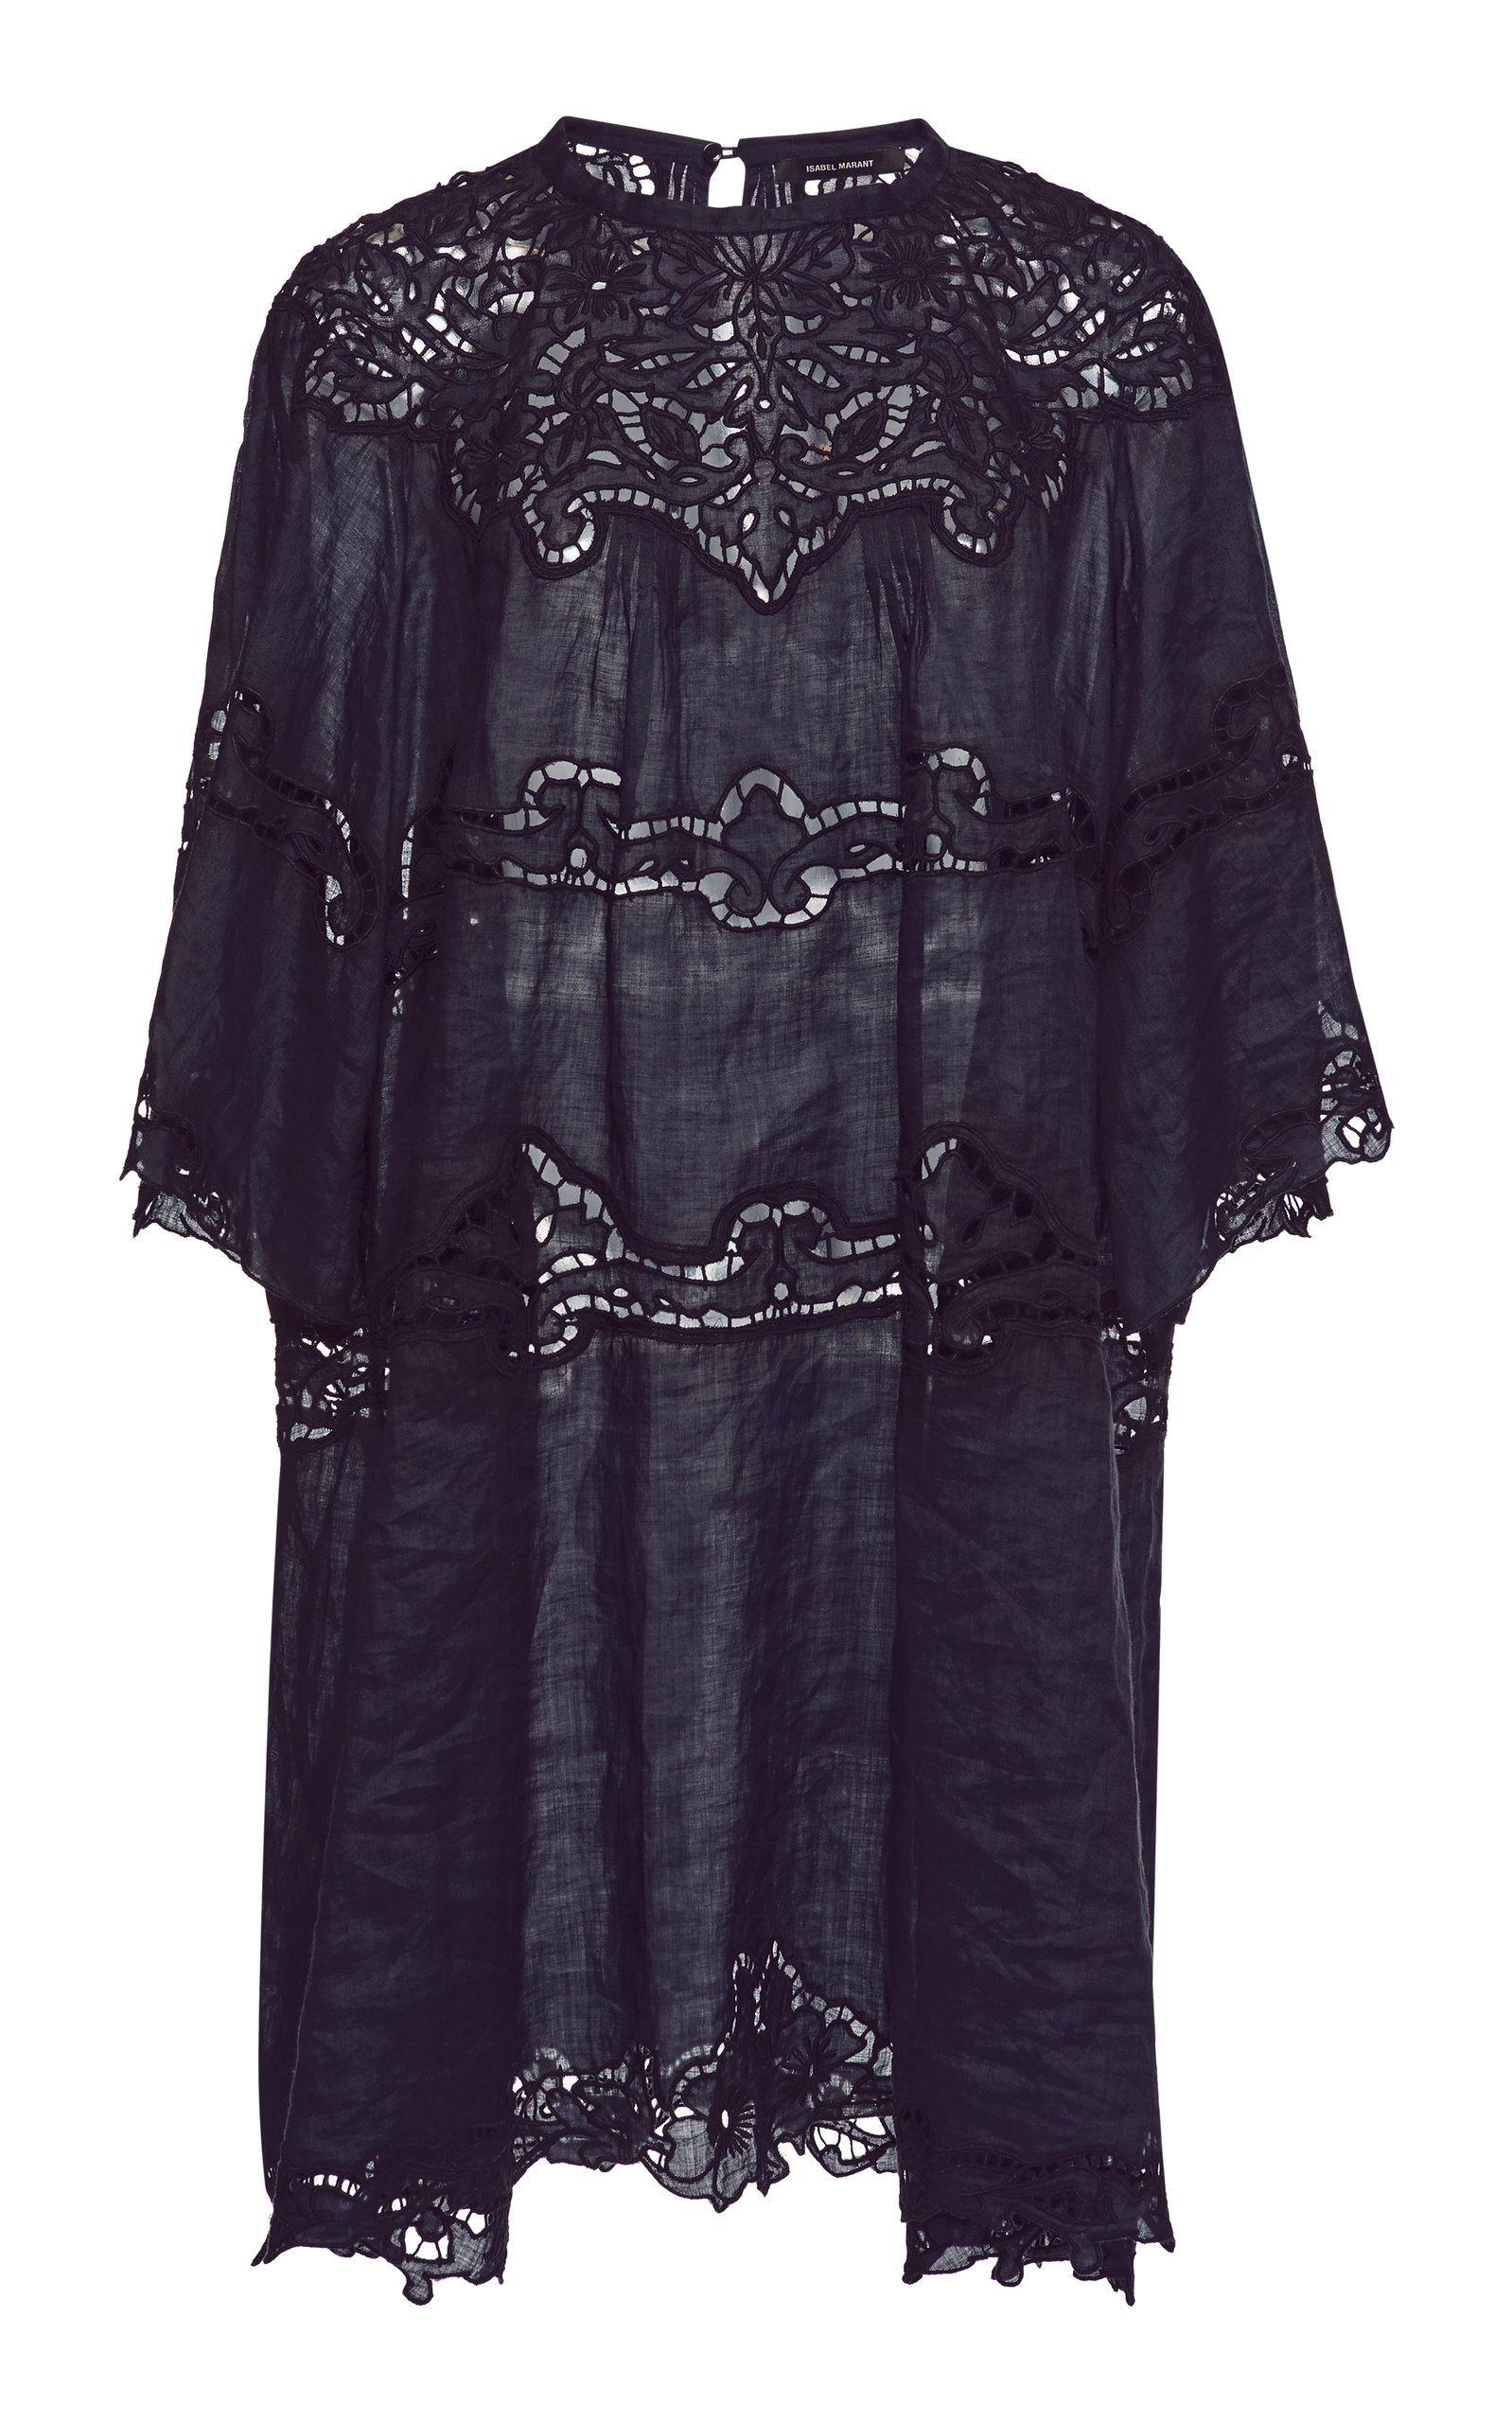 f4b7da08ea9063 Isabel Marant Marlone Lace-Trimmed Ramie Dress In Black | ModeSens